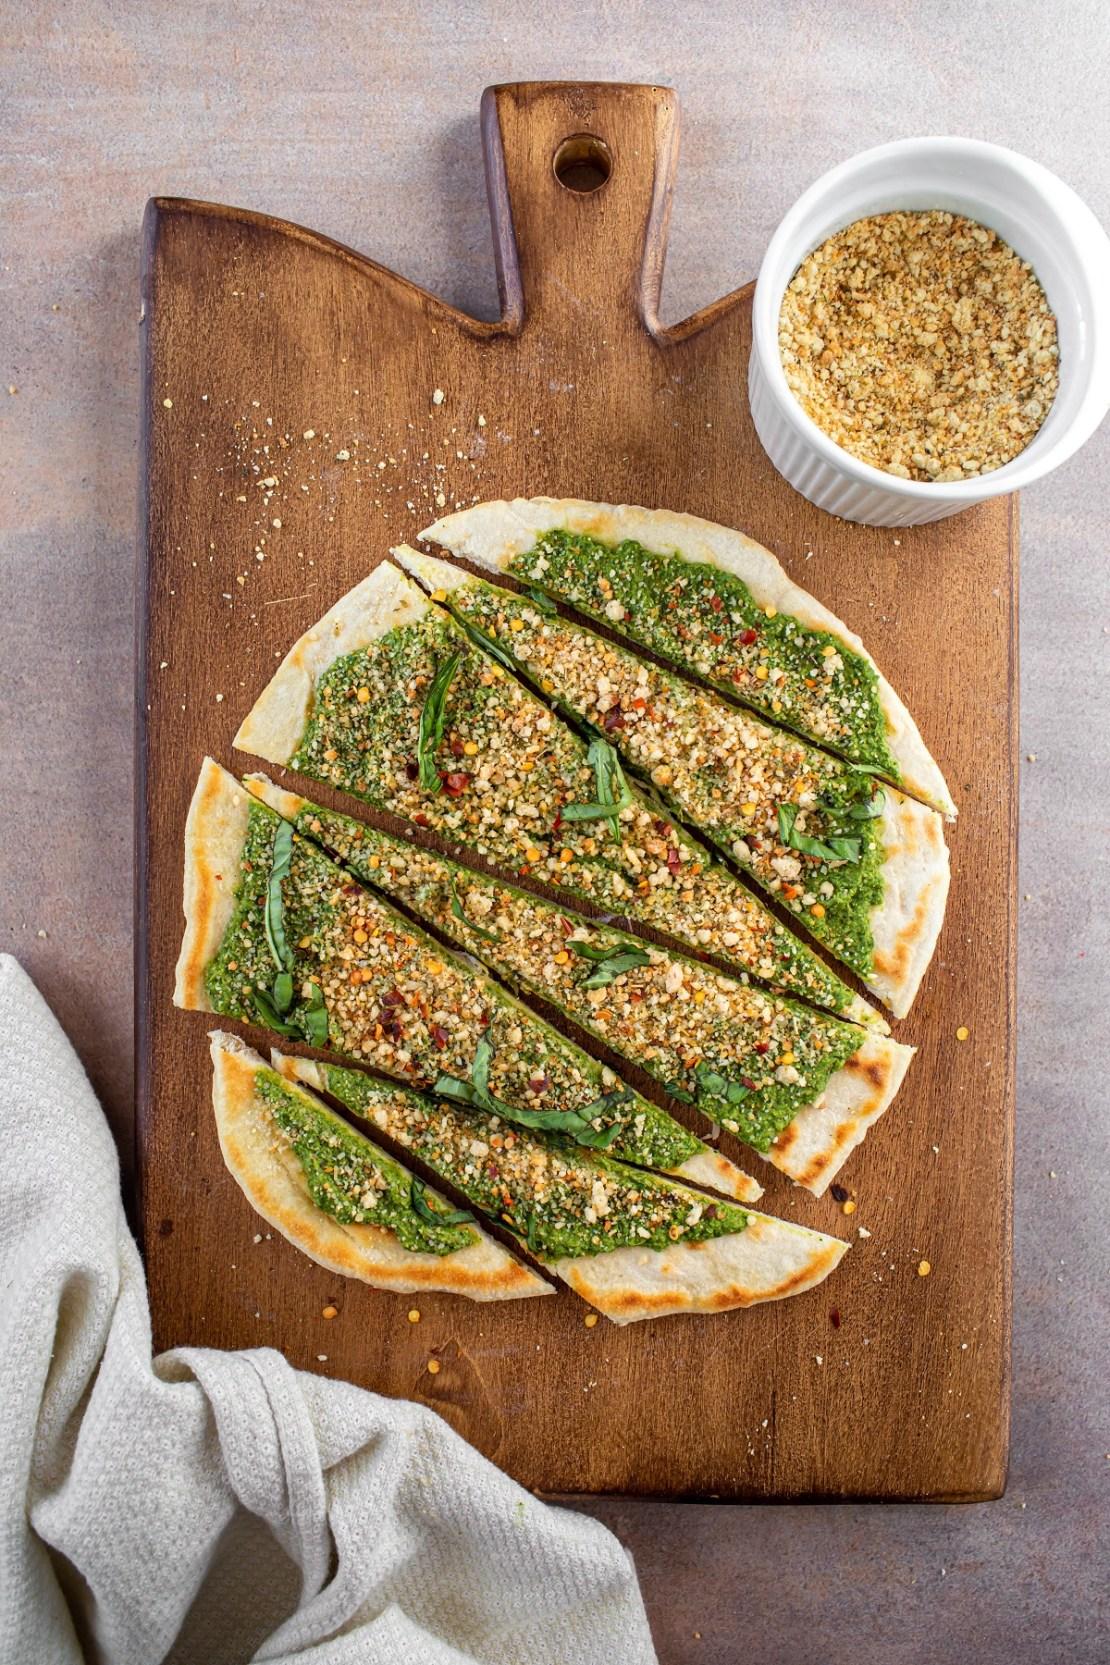 pesto on flatbread with vegan parmesan cheese on wood platter